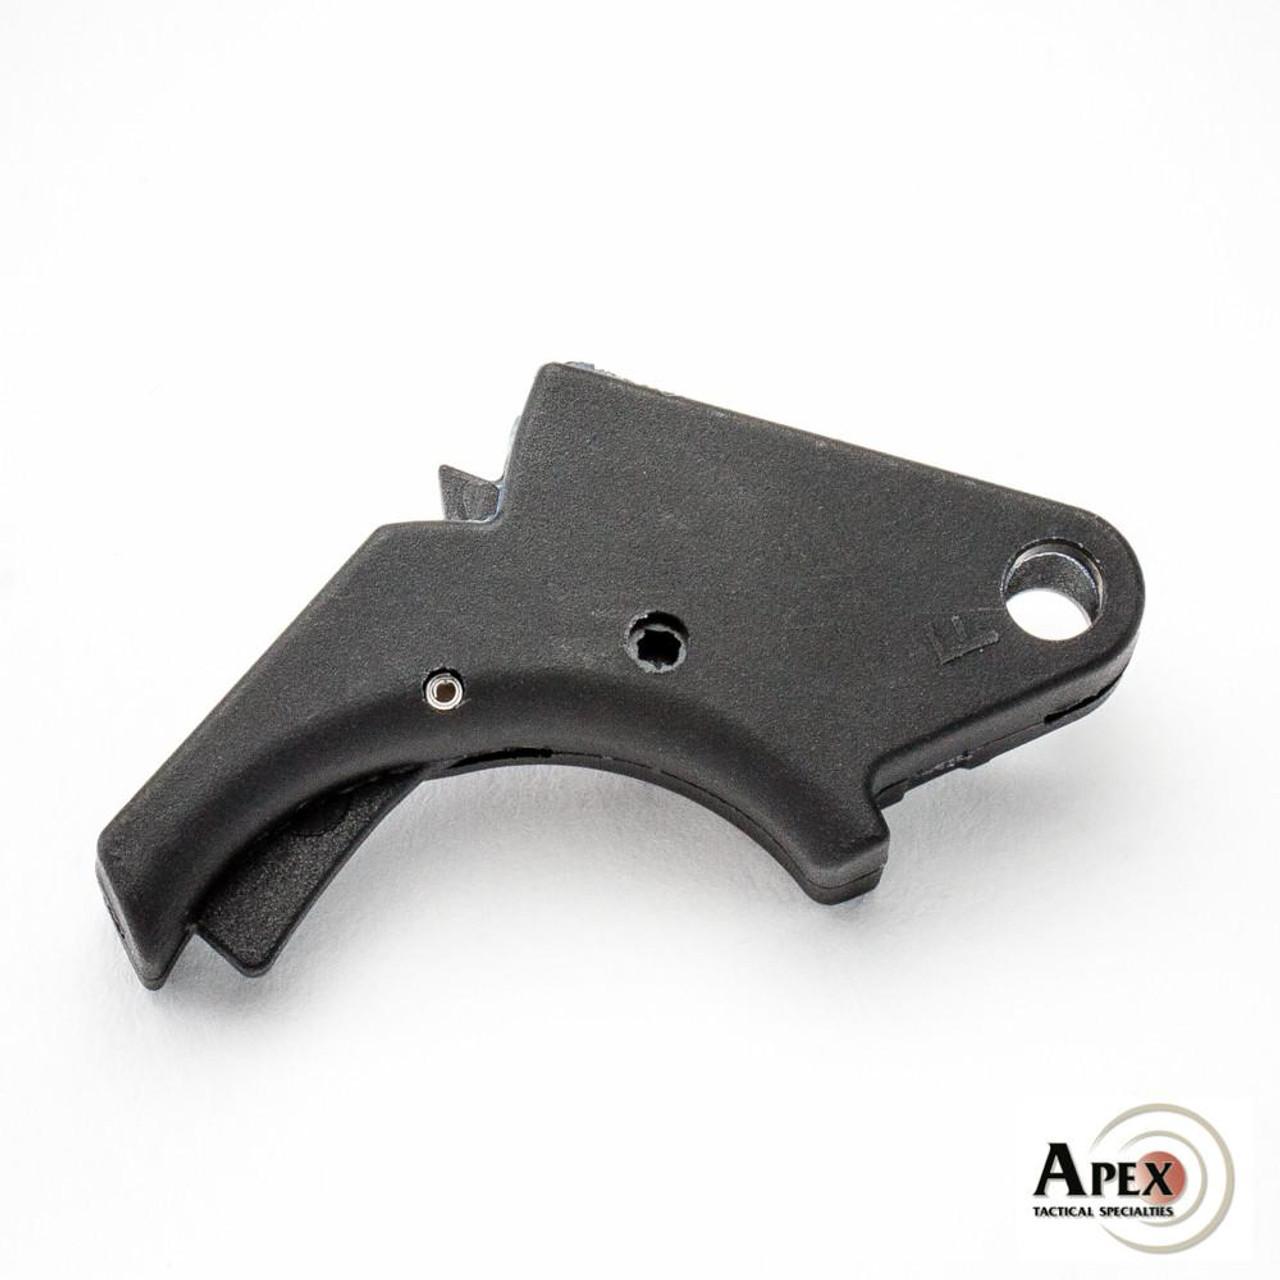 Apex M&P Polymer Forward Set Sear & Trigger Kit